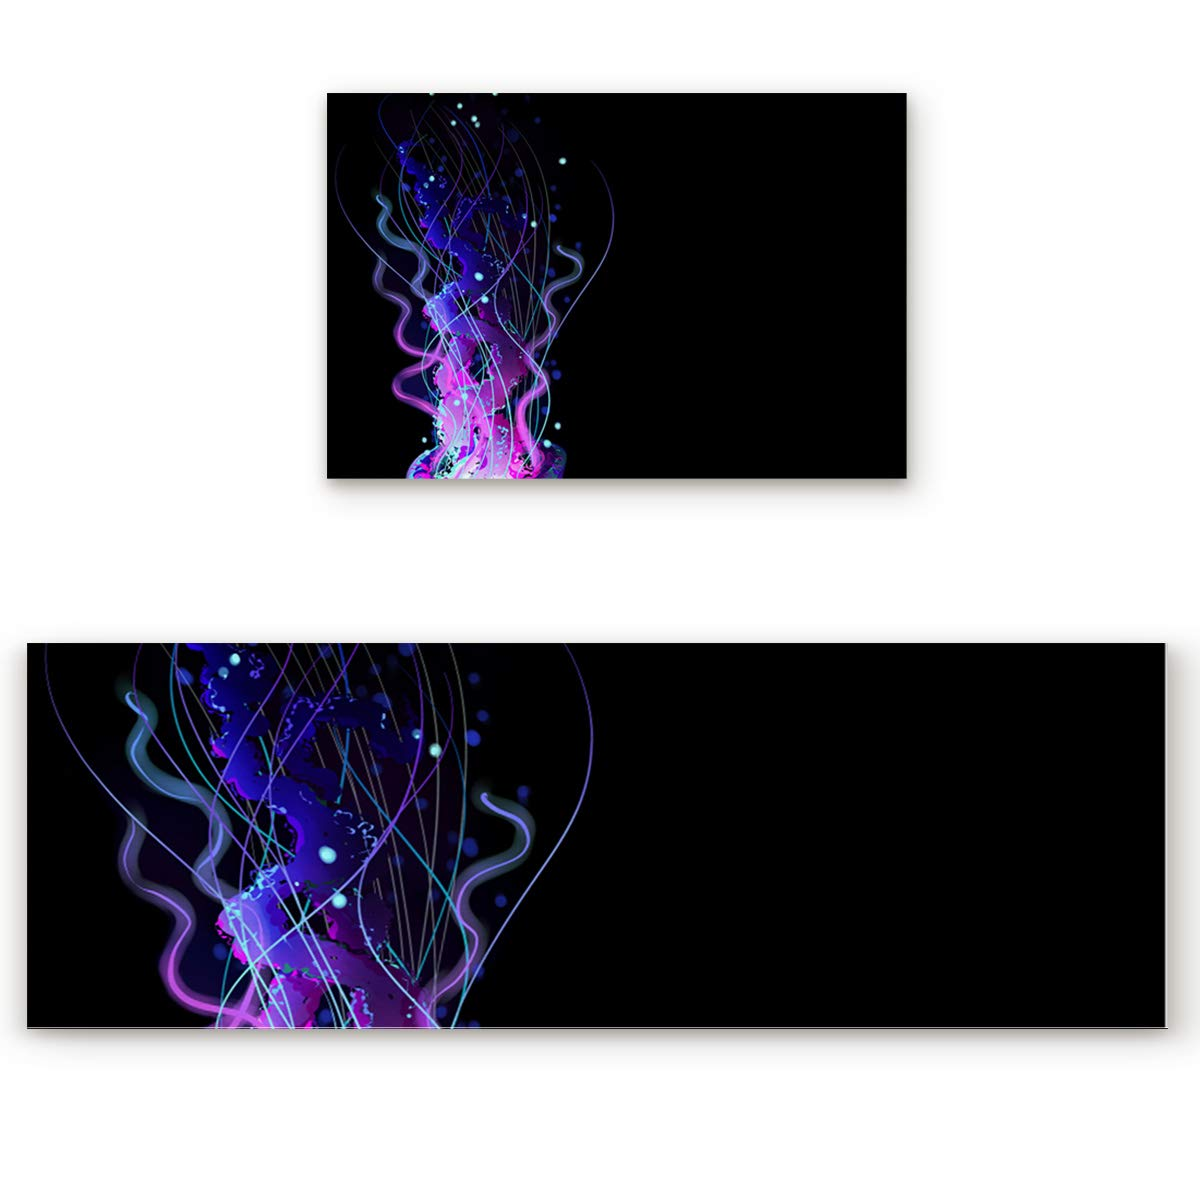 Jellyfish4san3196 19.7 x31.5 +19.7 x47.2  Savannan 2 Piece Non-Slip Kitchen Bathroom Entrance Mat Absorbent Durable Floor Doormat Runner Rug Set - Tropical Plants